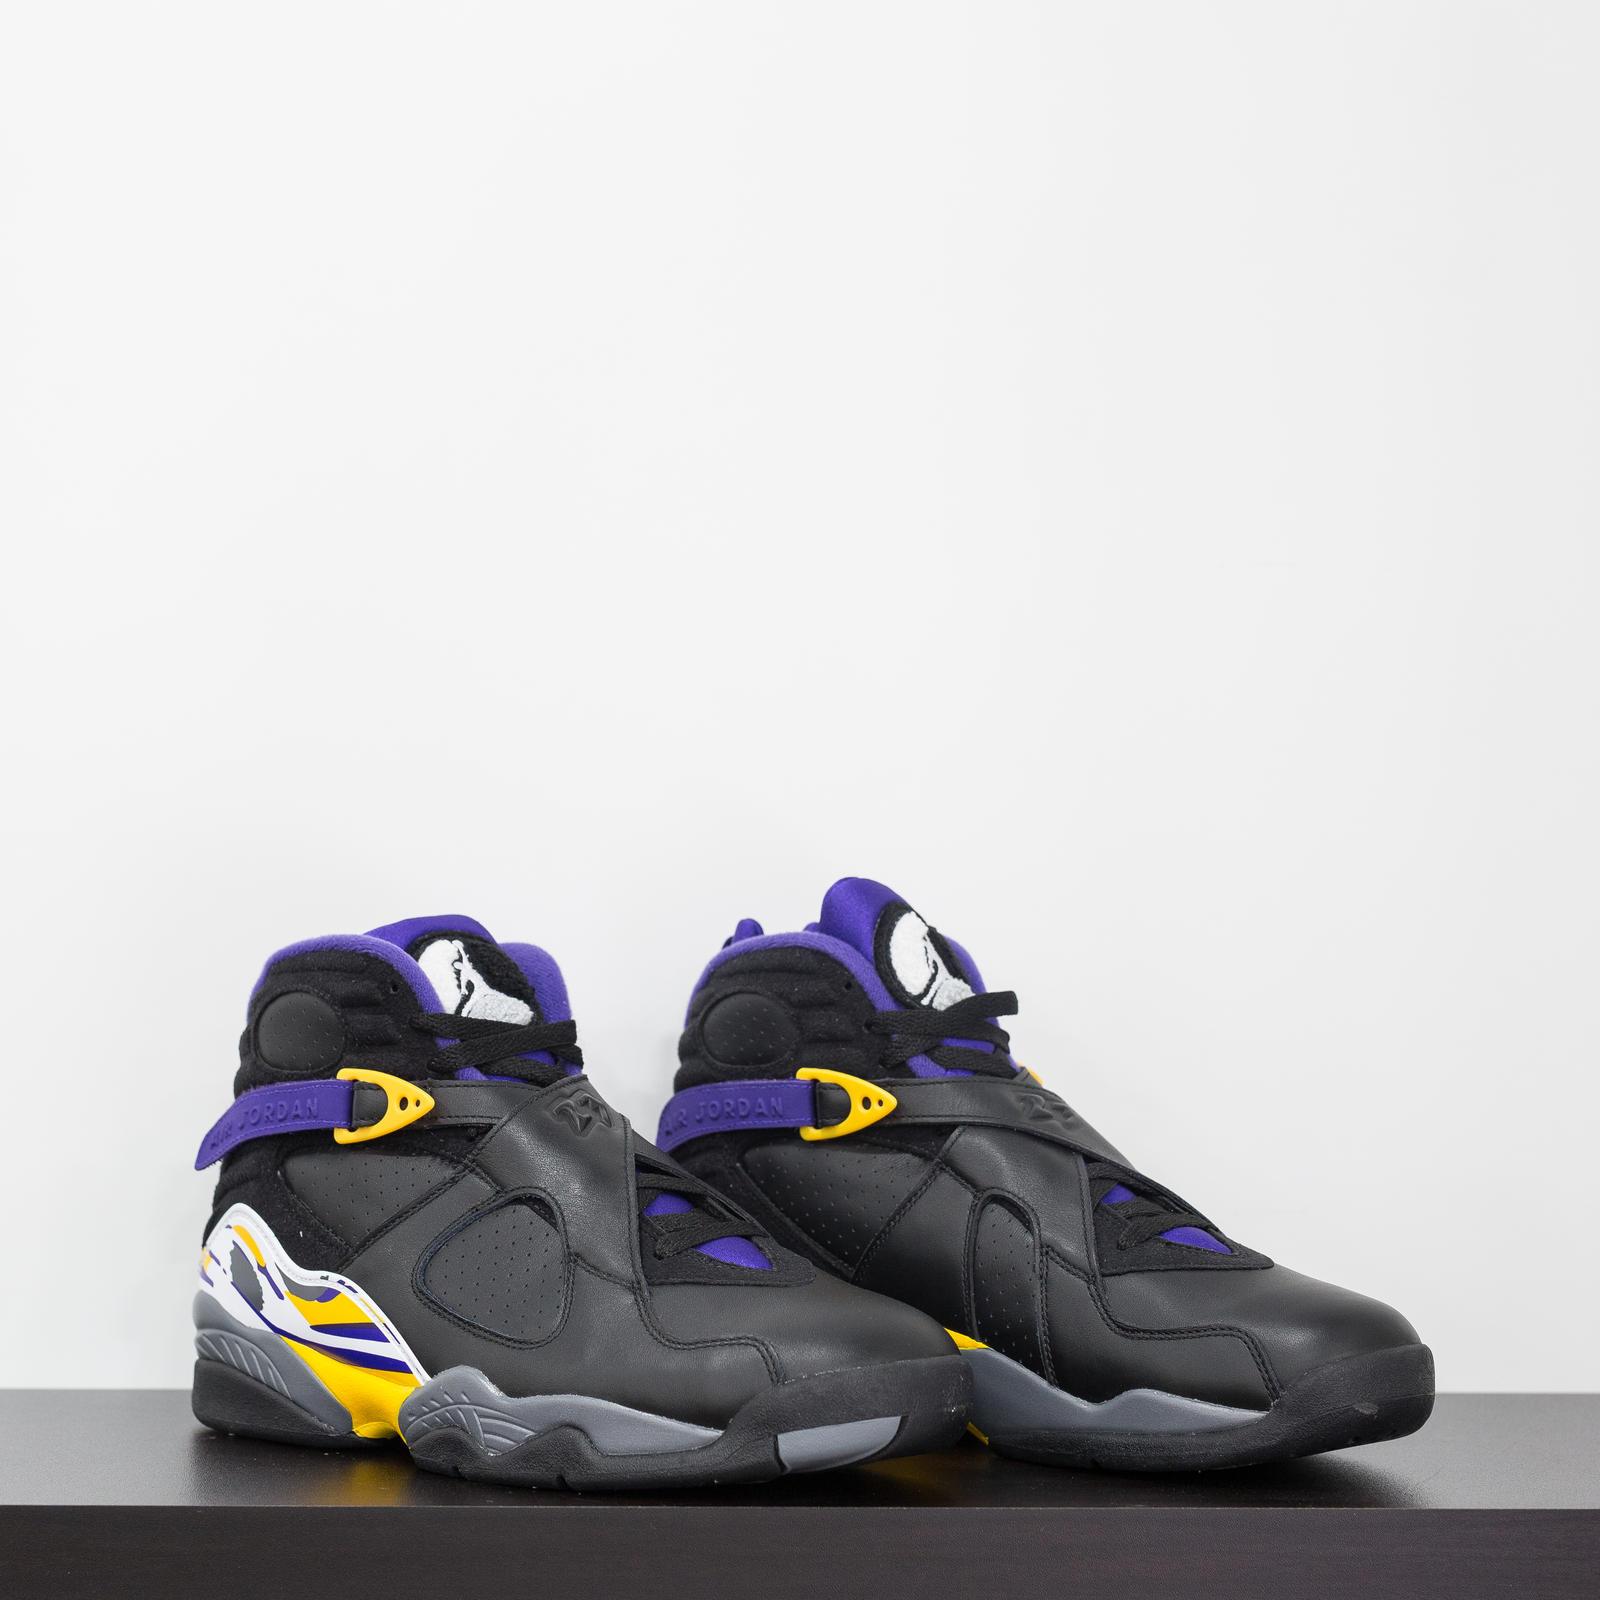 Jordan Brand Pays Tribute to Kobe Bryant - Nike News 43eaa5c3e